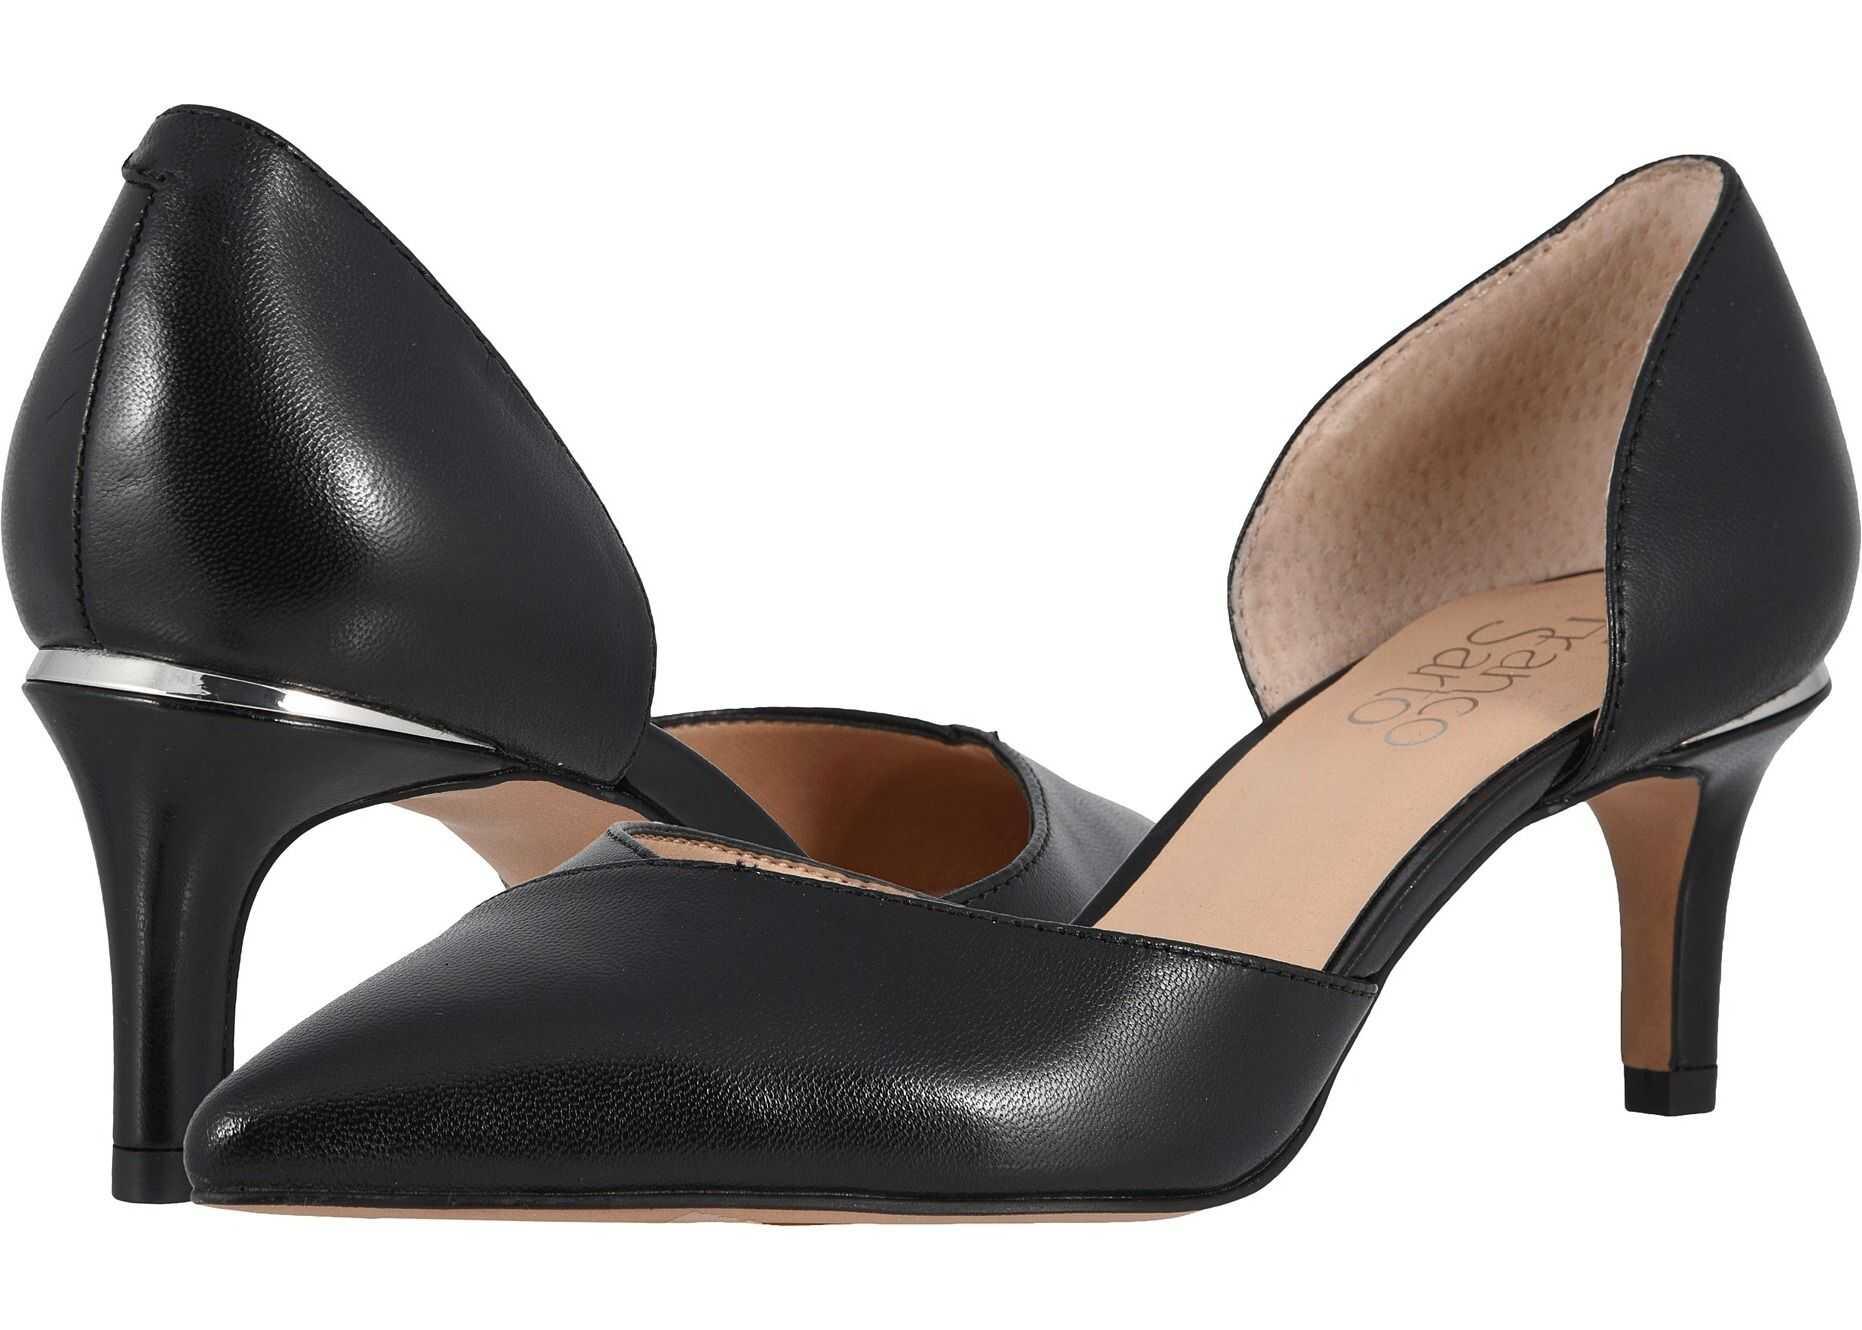 Franco Sarto Daisi Black Leather